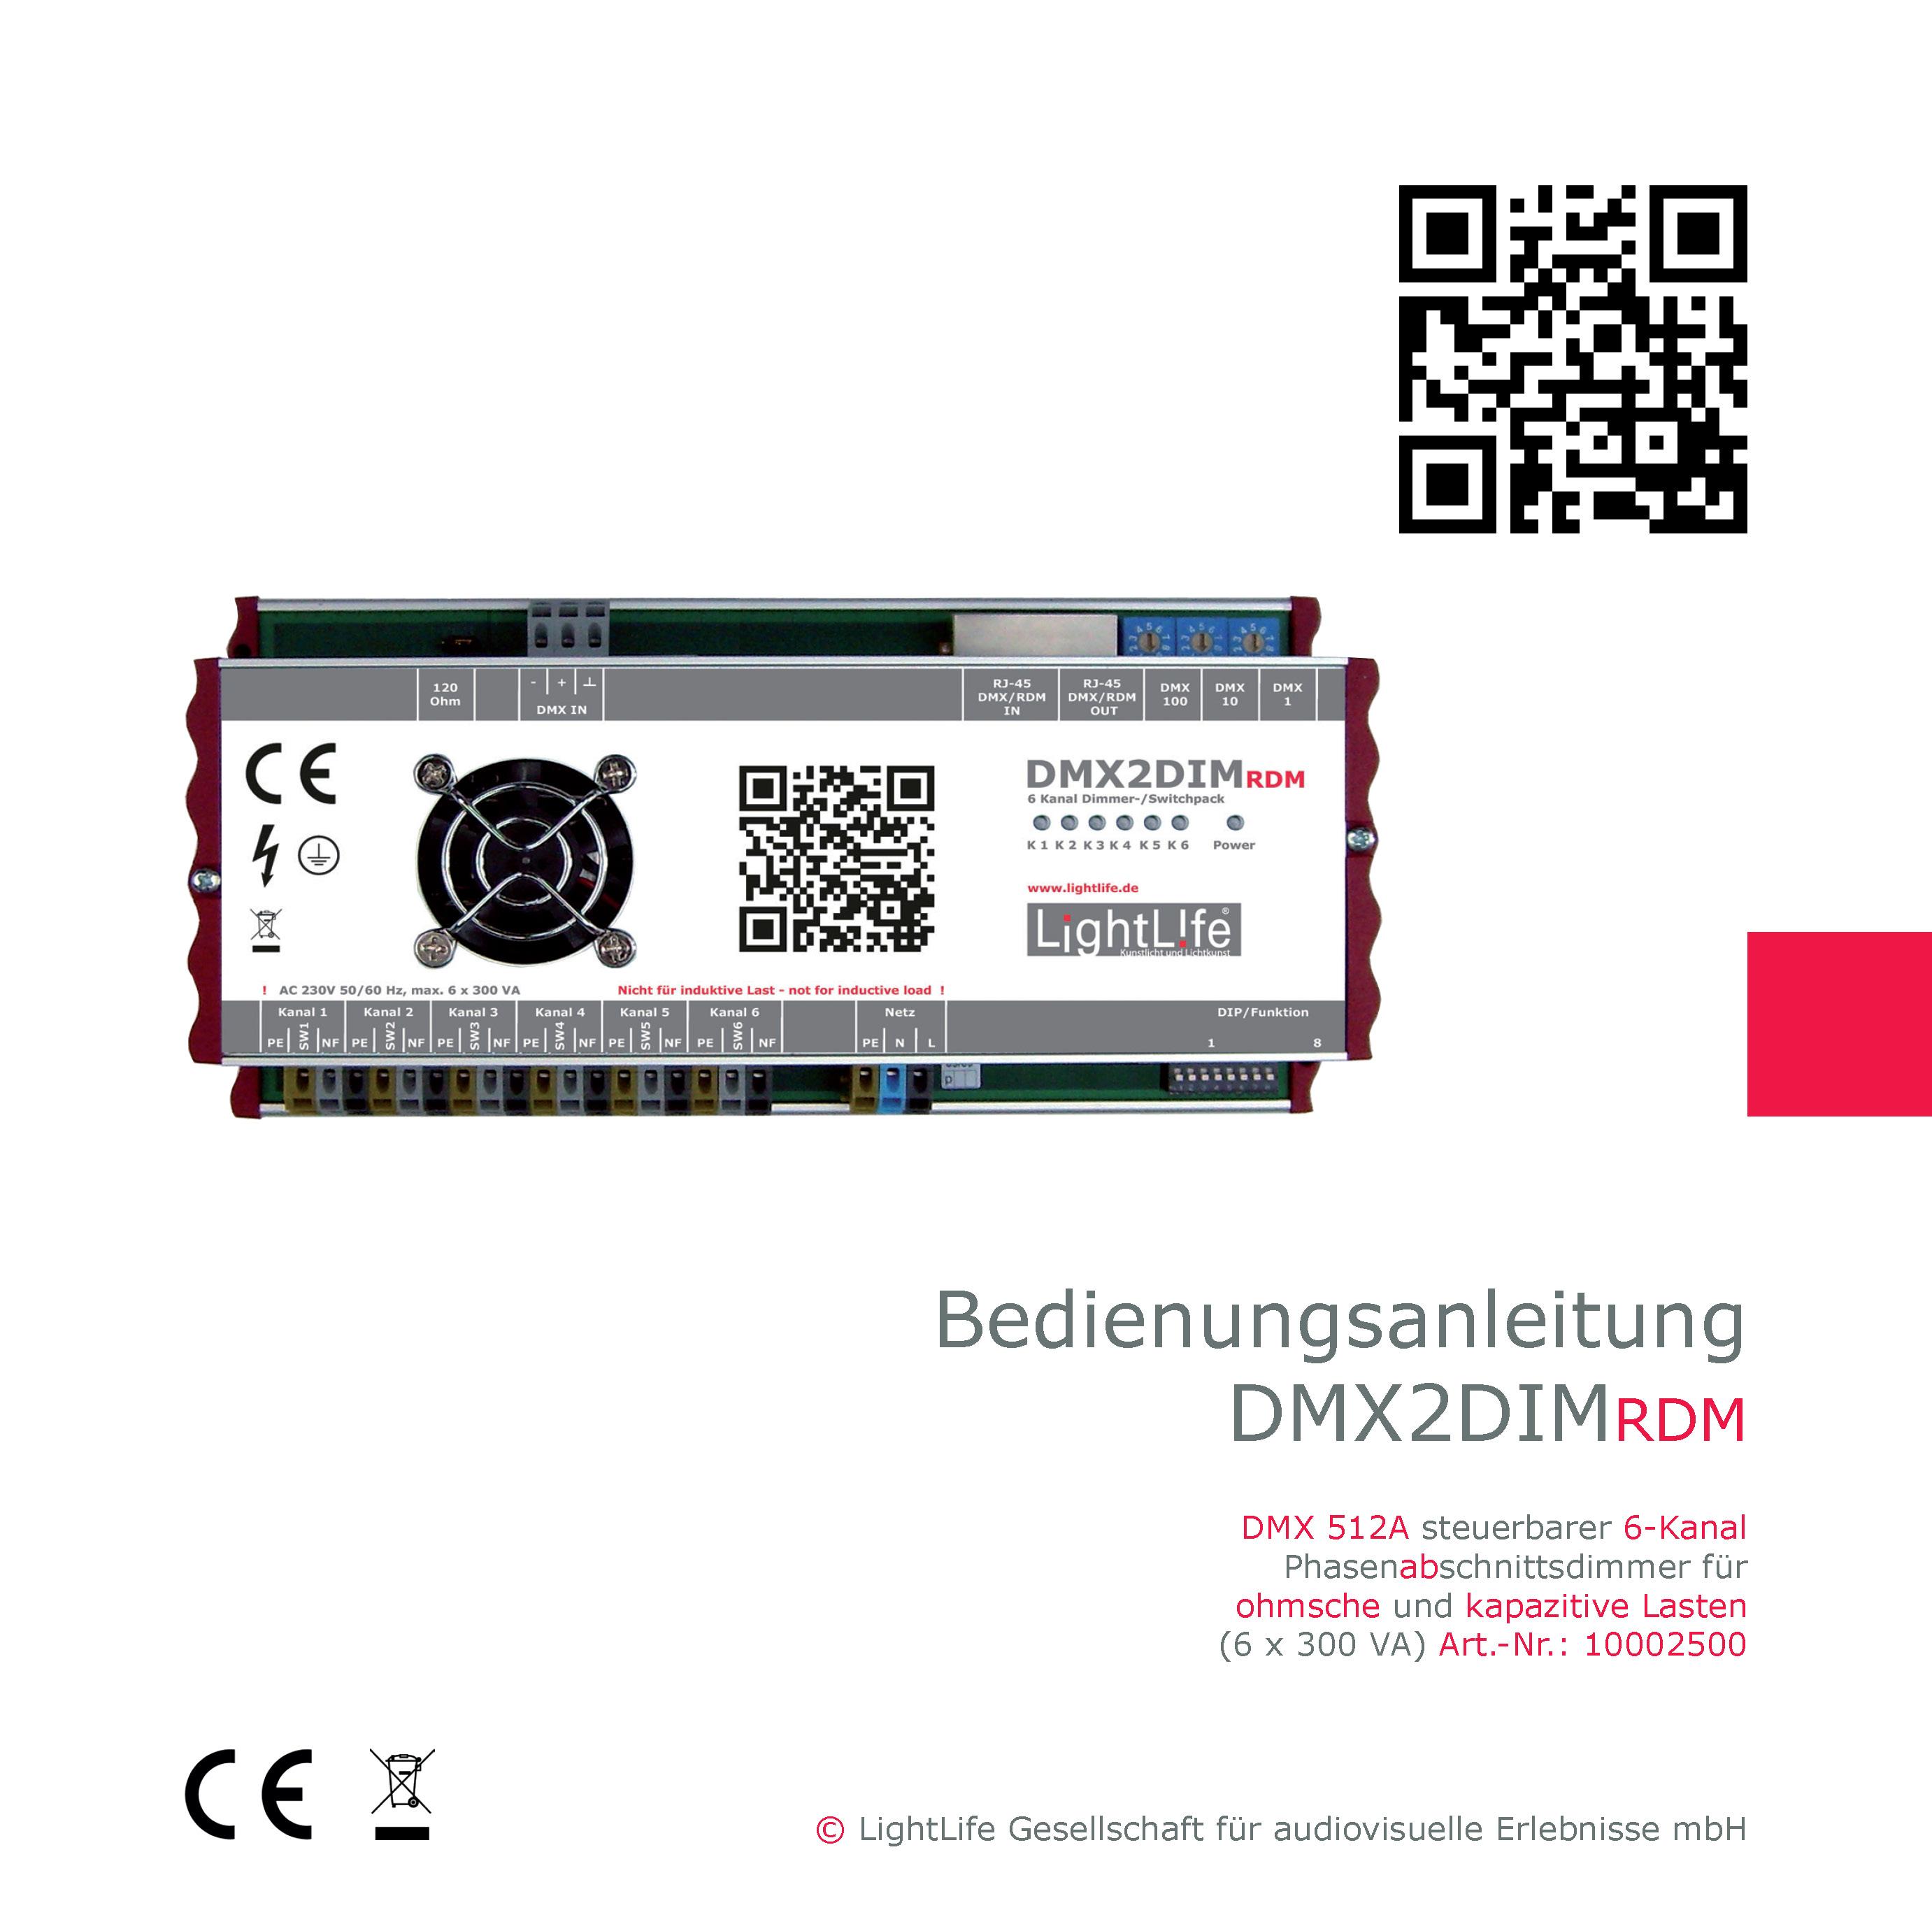 Bedienungsanleitung DMX2DIM-RDM